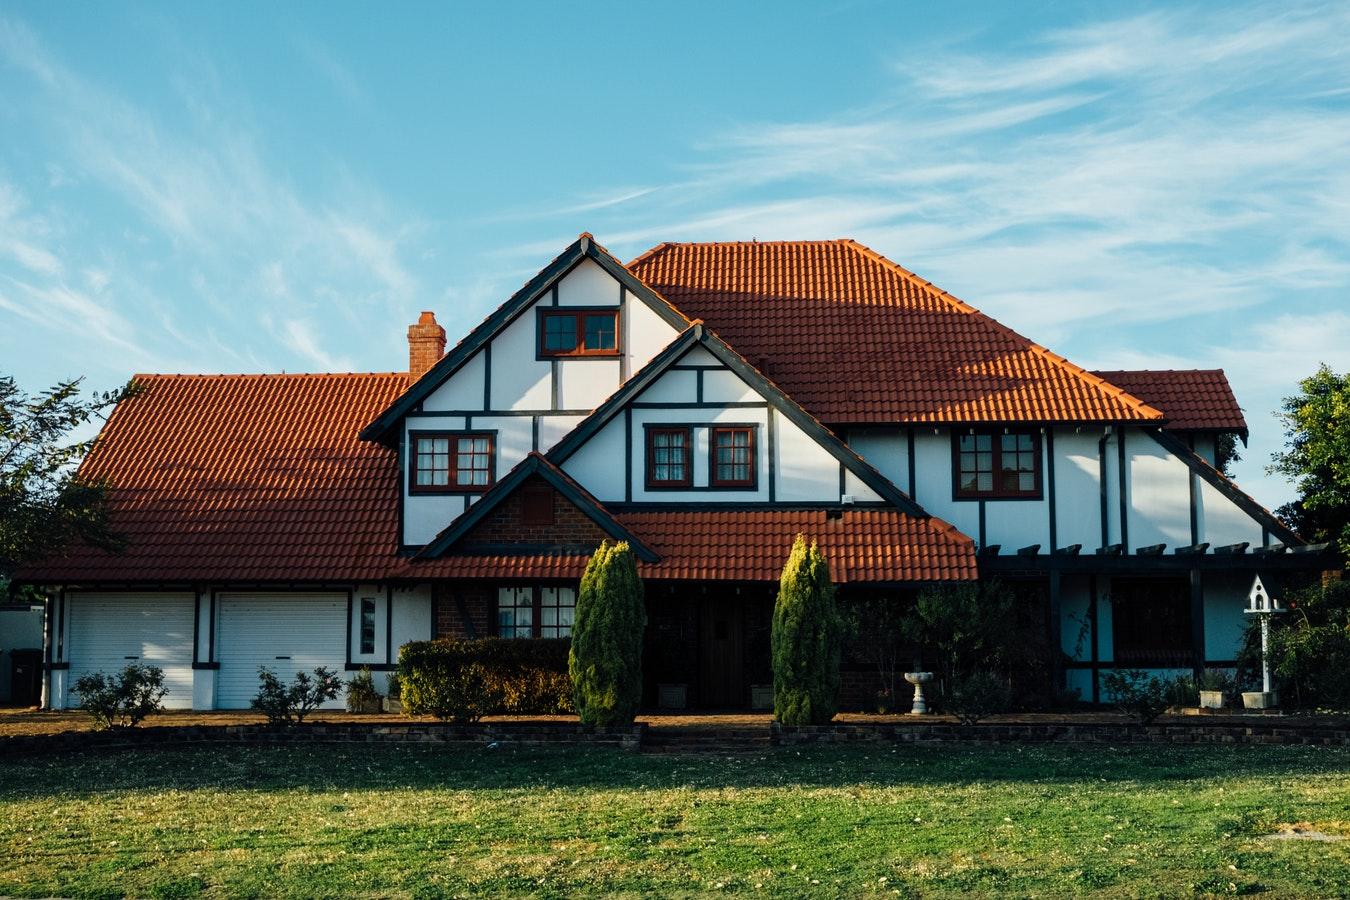 Australian Housing Styles | 6 Popular Home Designs in Australia